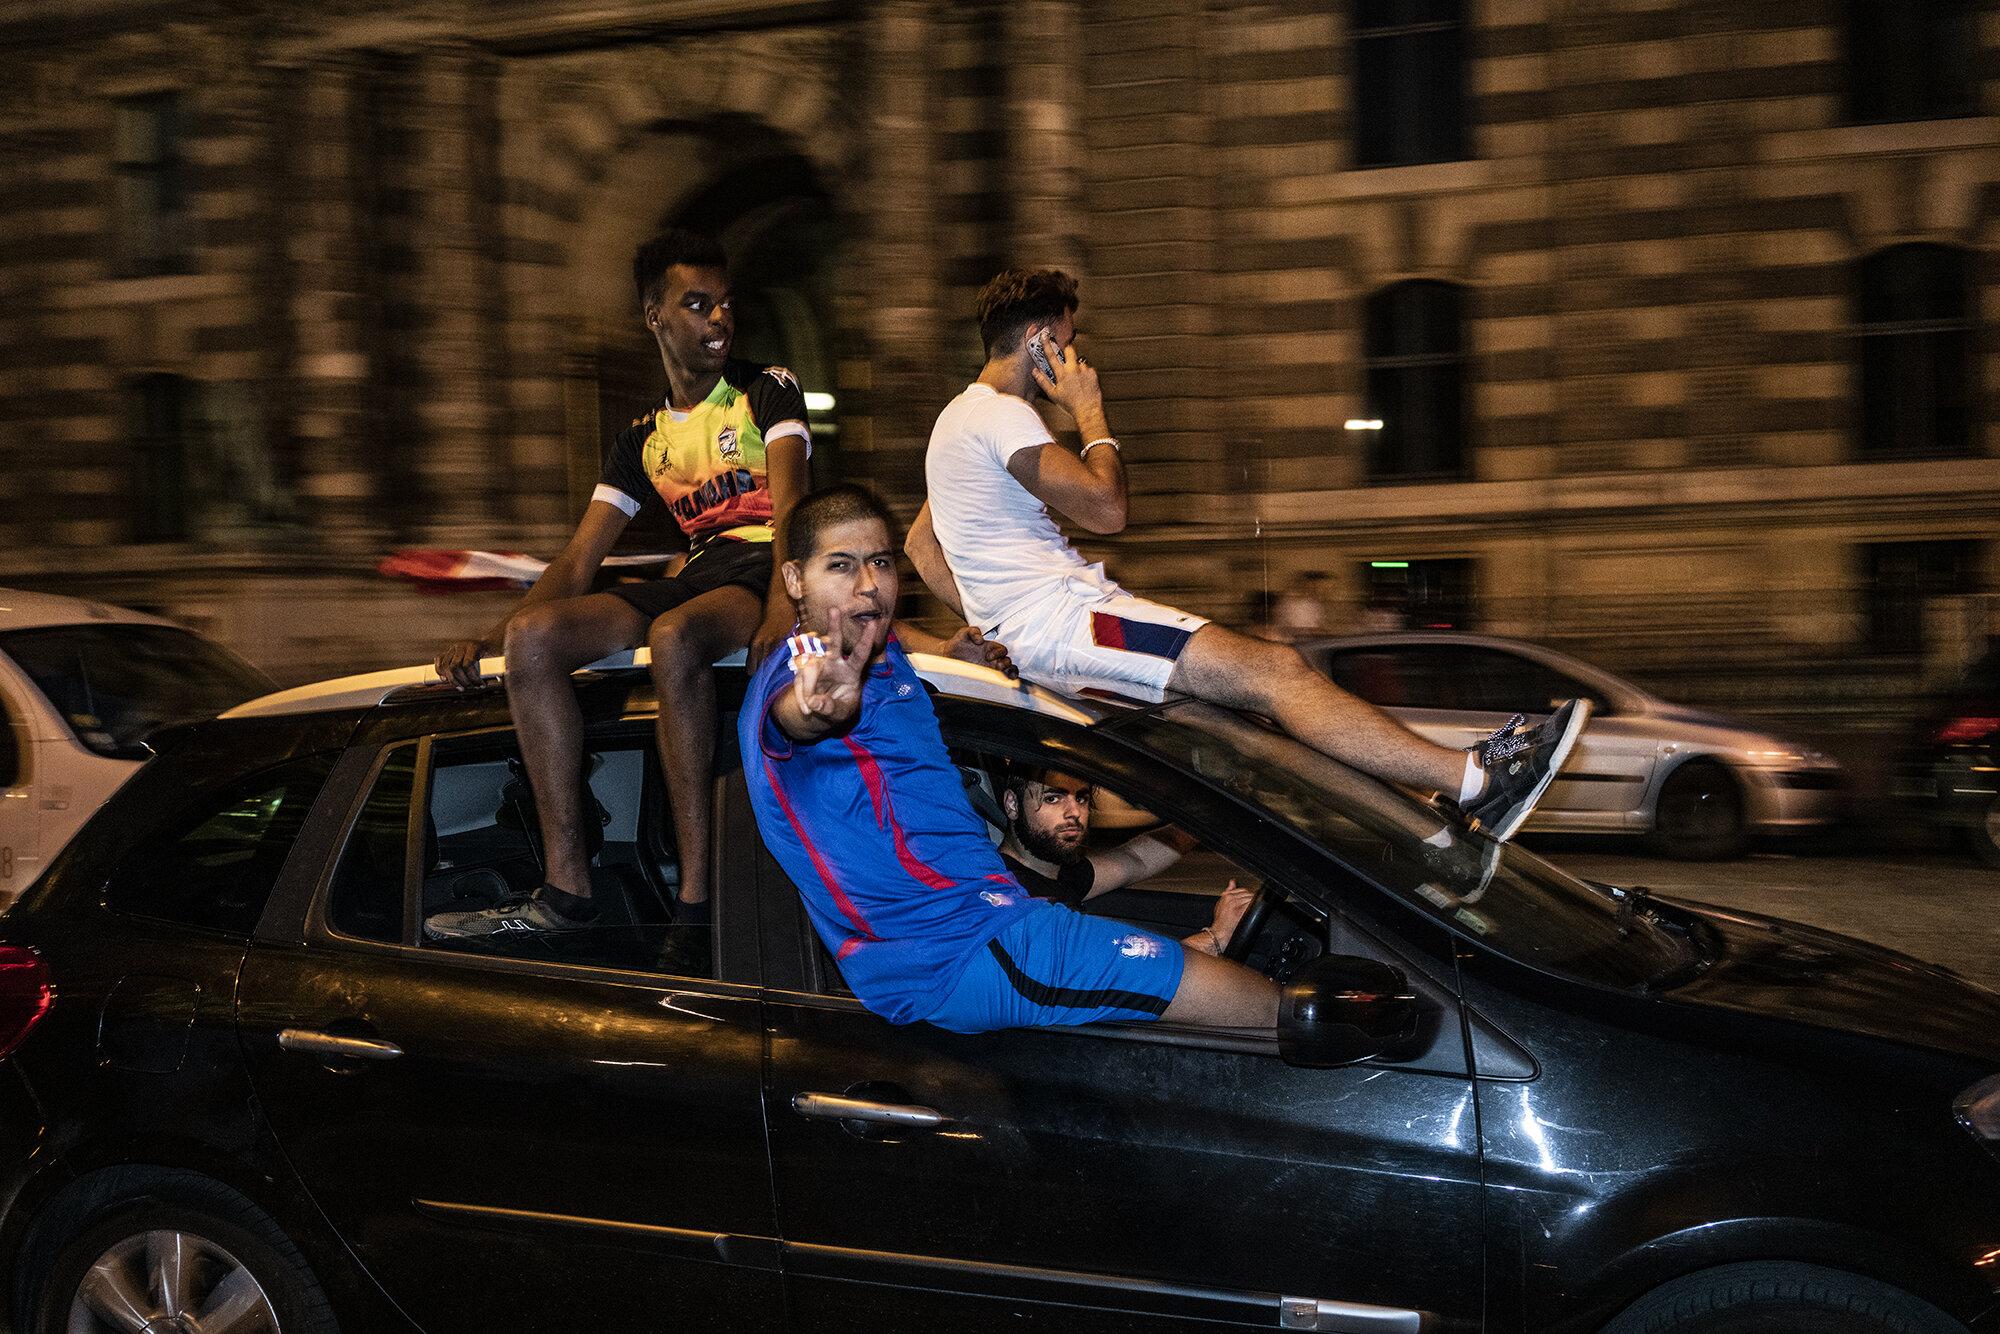 Paris_Street_2018_In_Car_Celebration-066.jpg